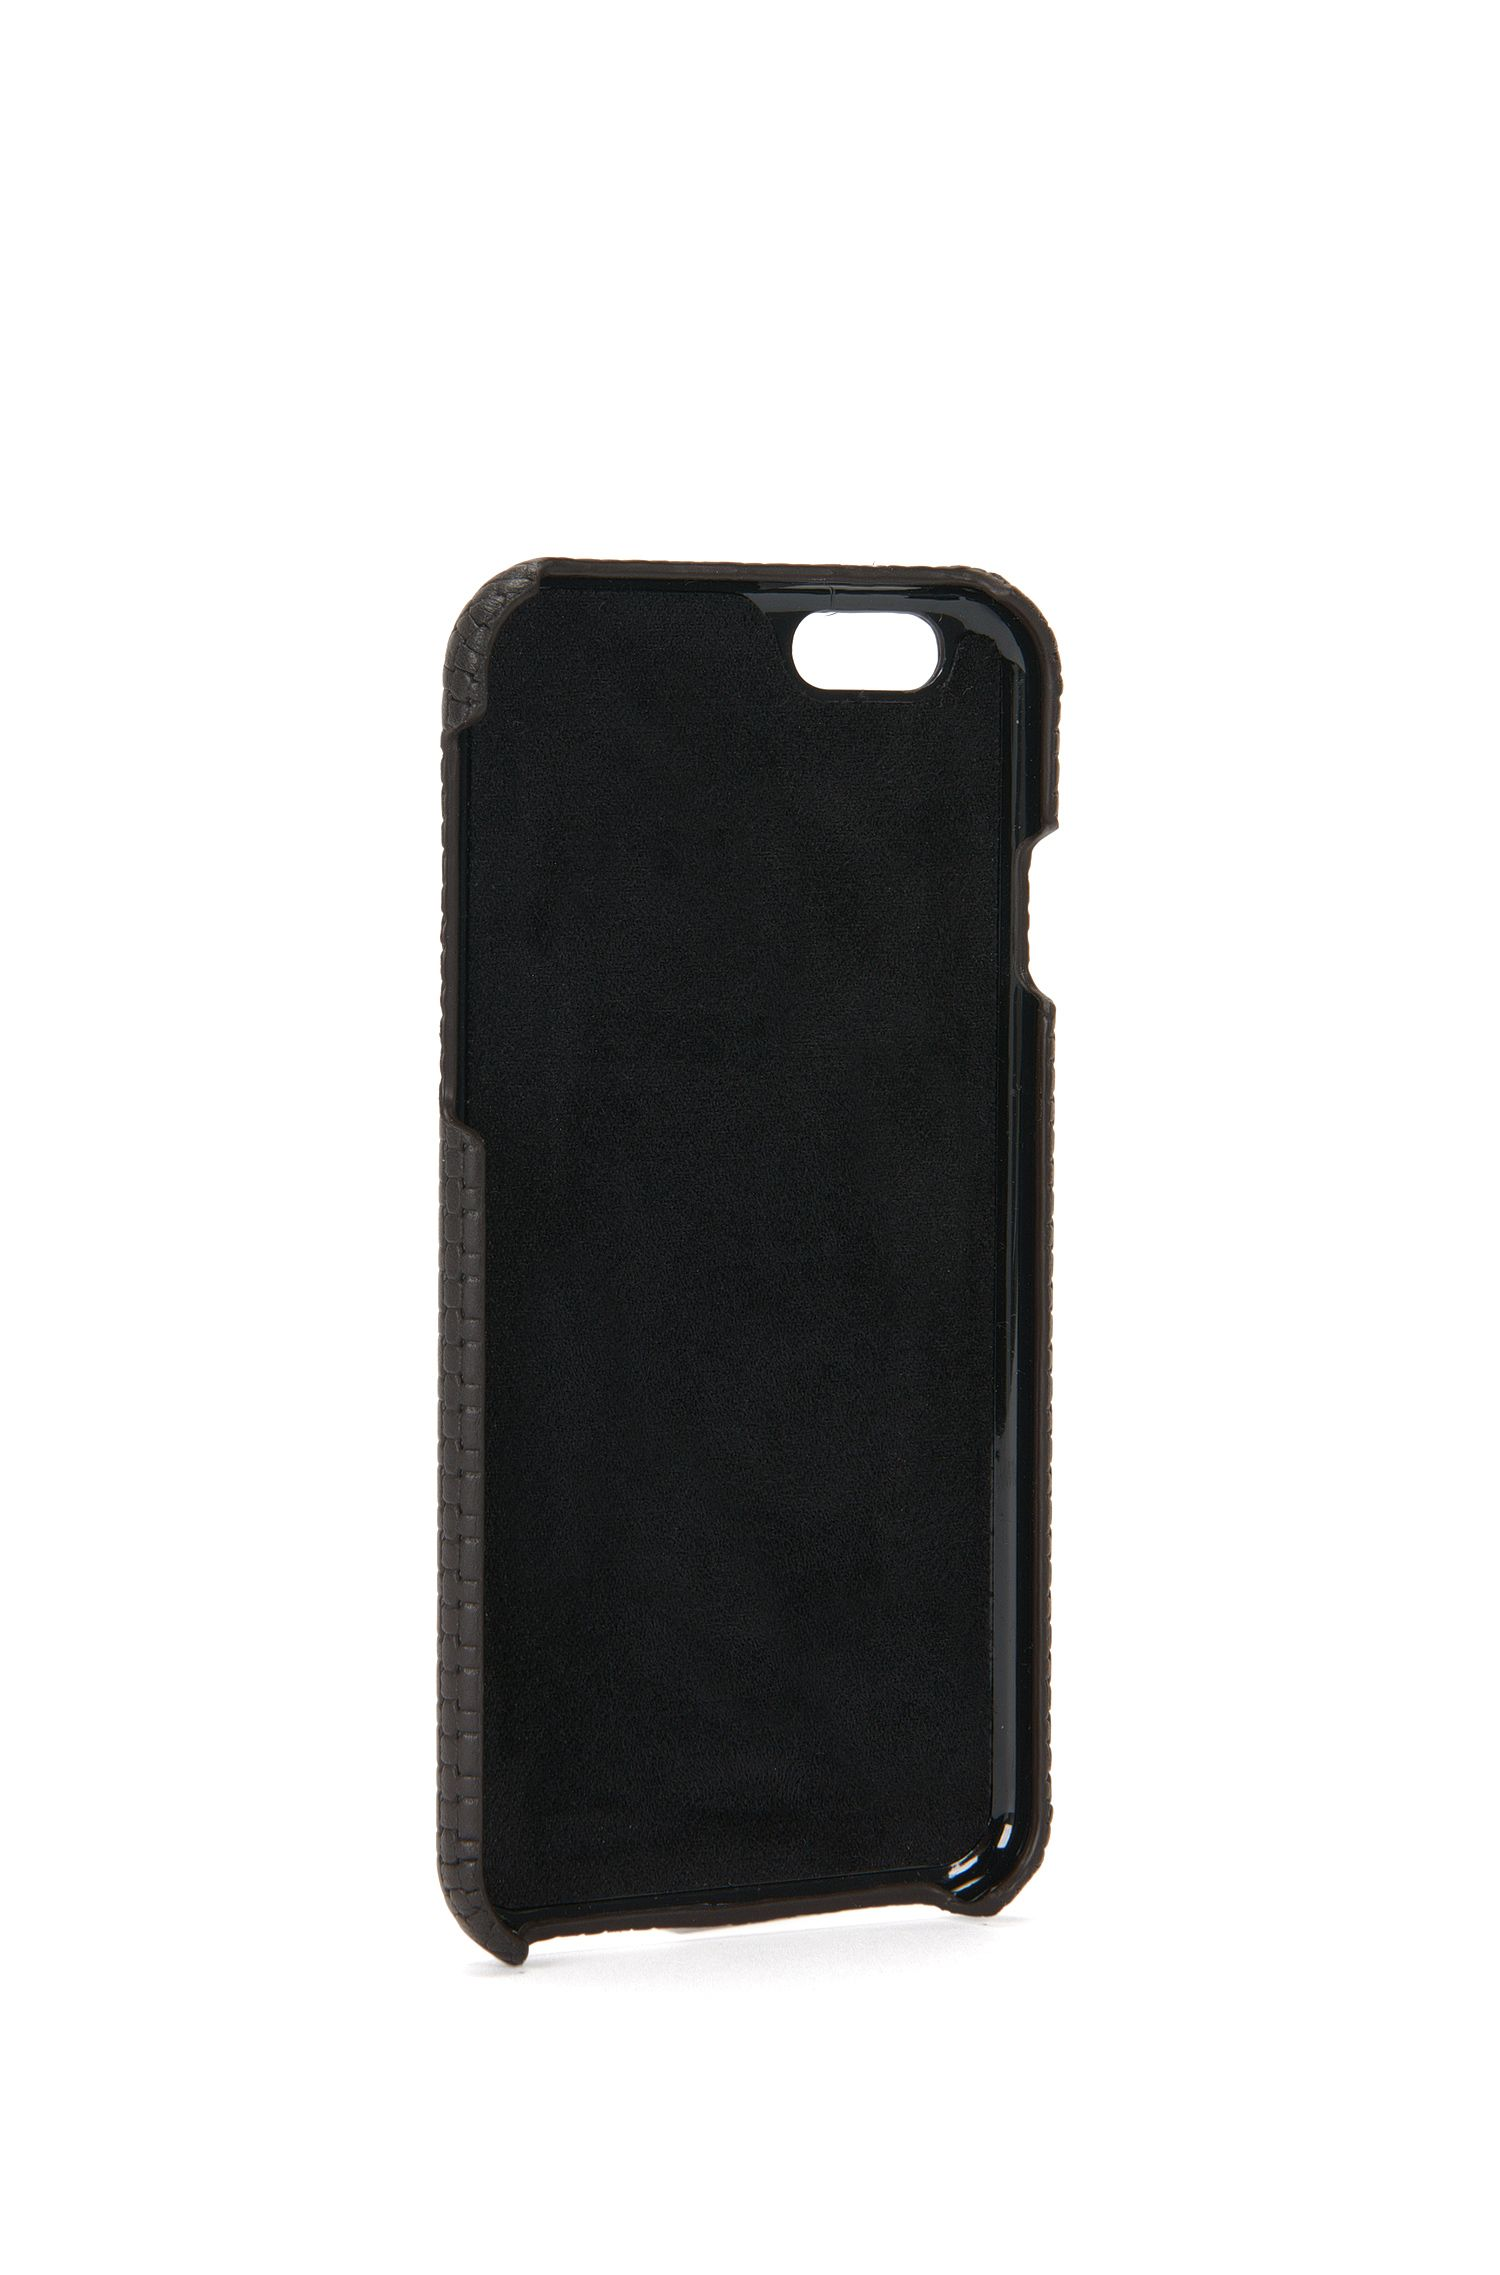 Smartphone-Cover für das iPhone 6: 'Traveller B_Phone'